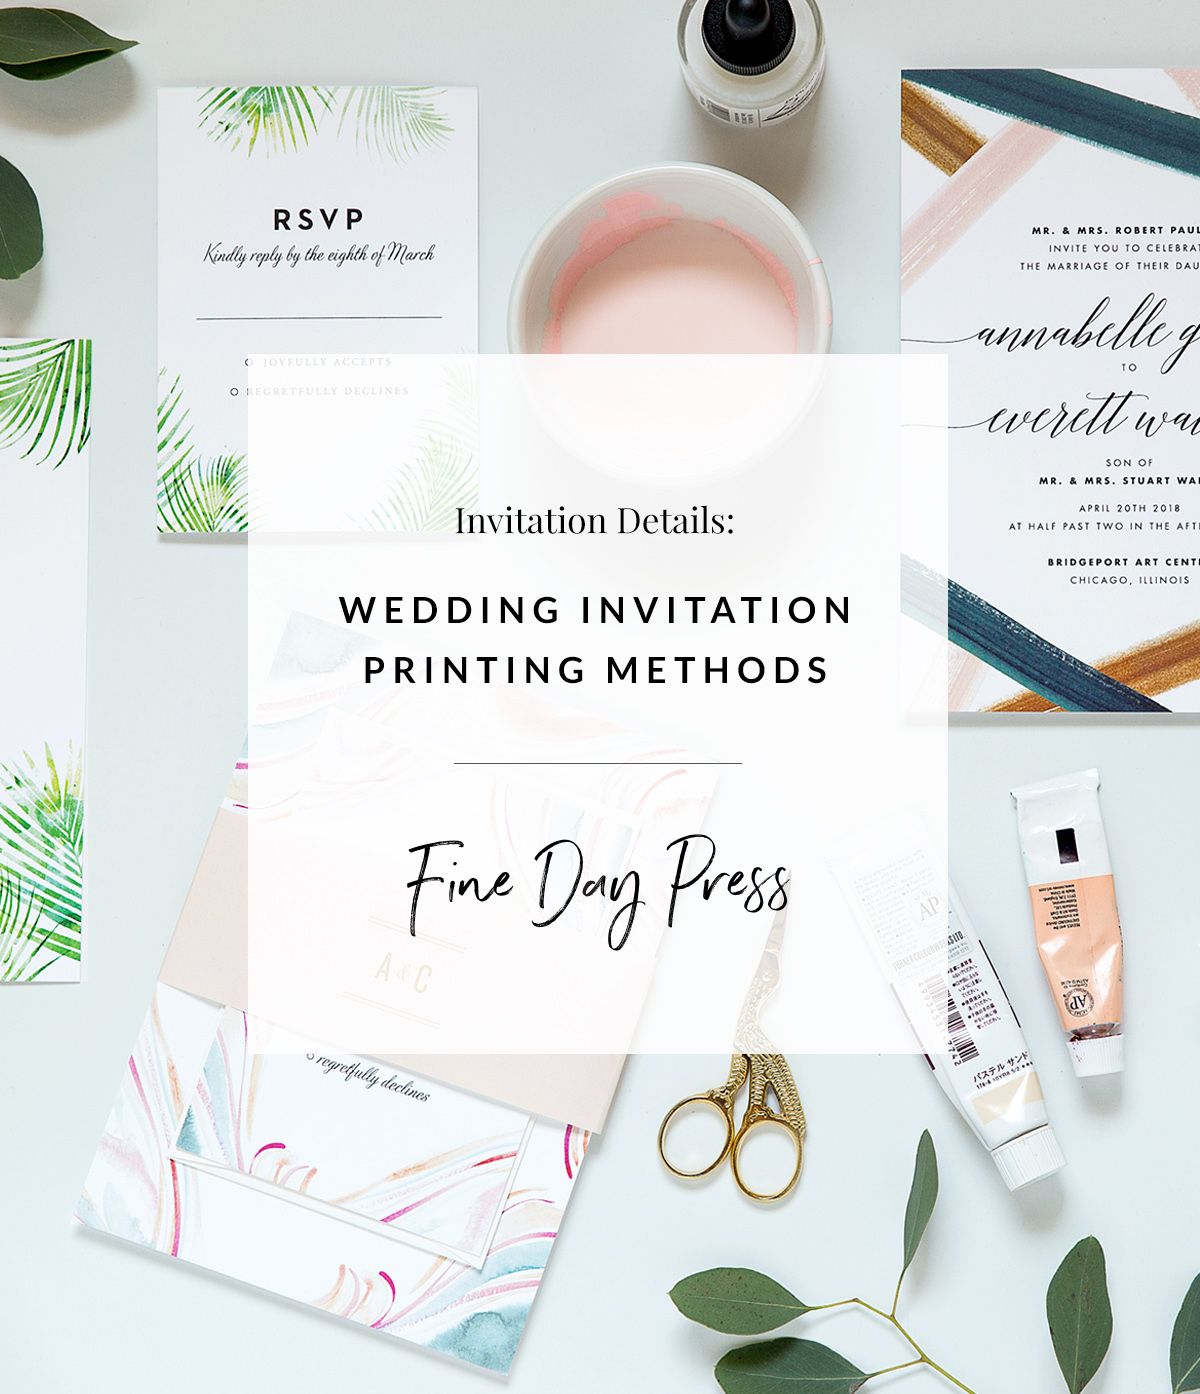 How to Print Wedding Invitations - Fine Day Press